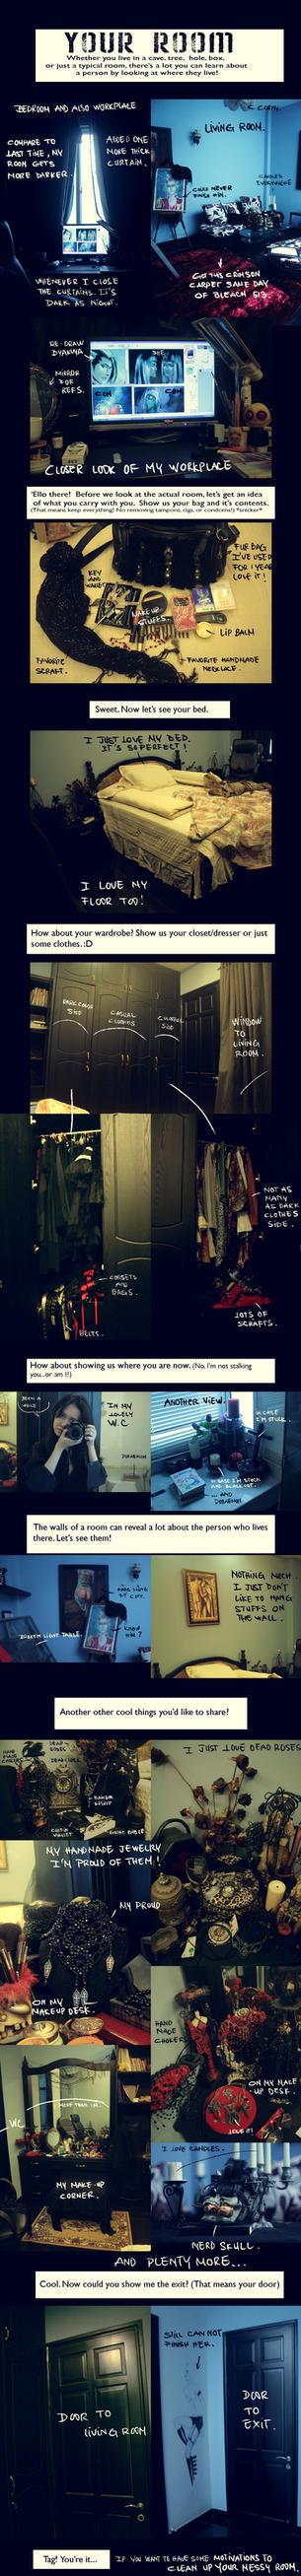 My Room Meme 2012 by NanFe